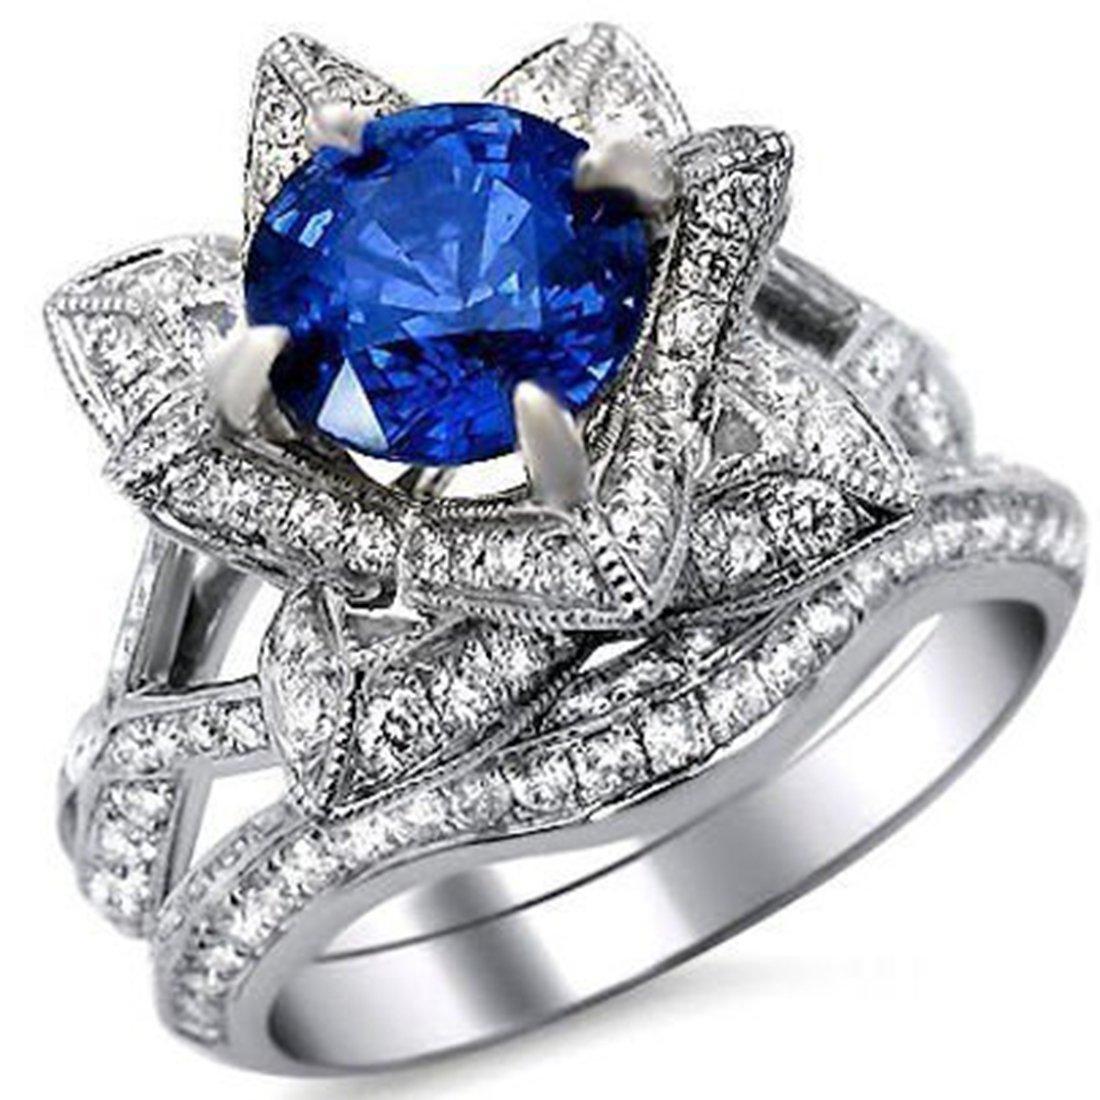 Smjewels 2.65 Ct Round Blue Sapphire Lotus Flower CZ Diamond Ring Bridal Set 14K White Gold Fn